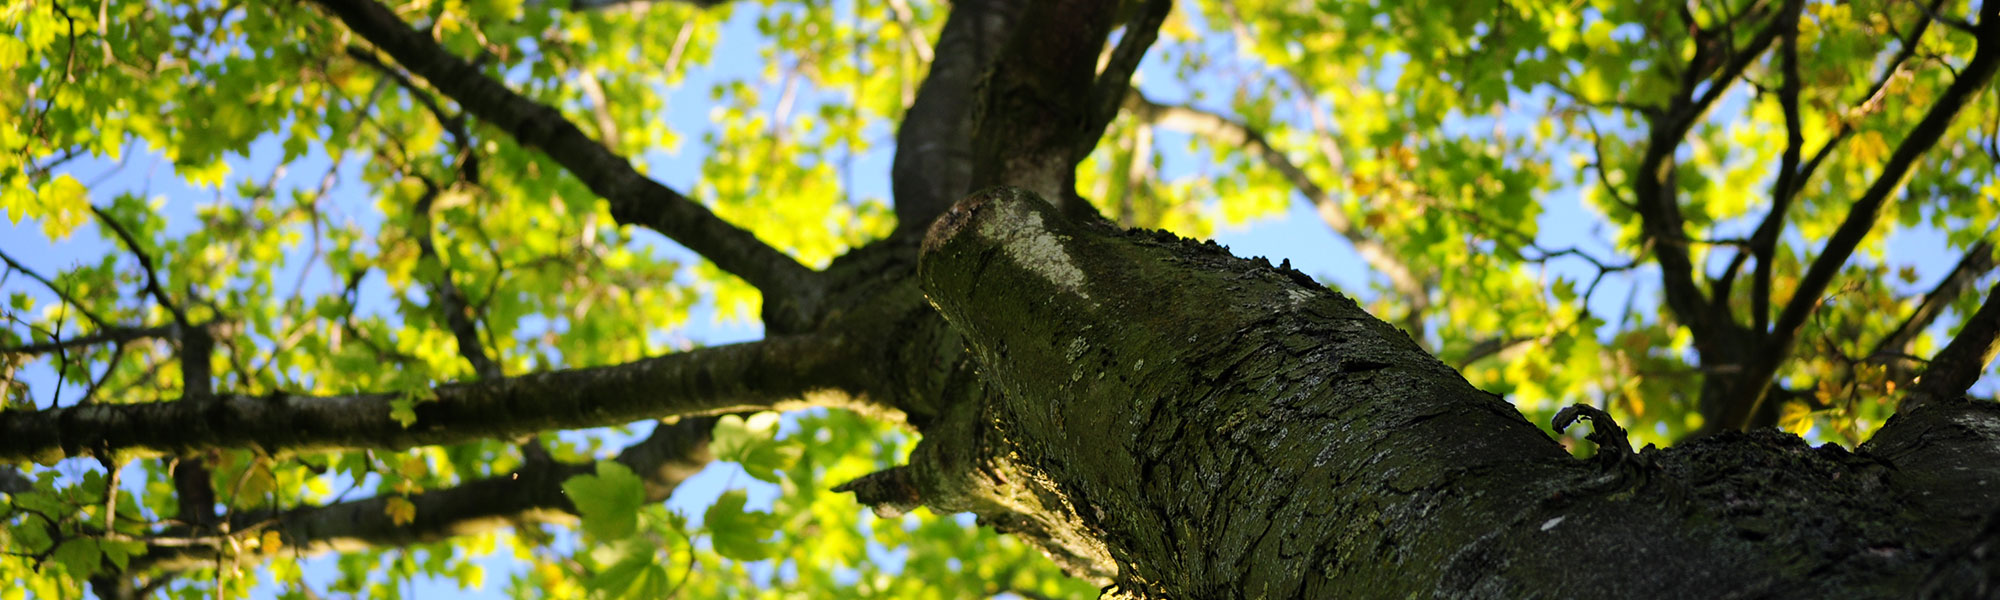 tree identification course online free